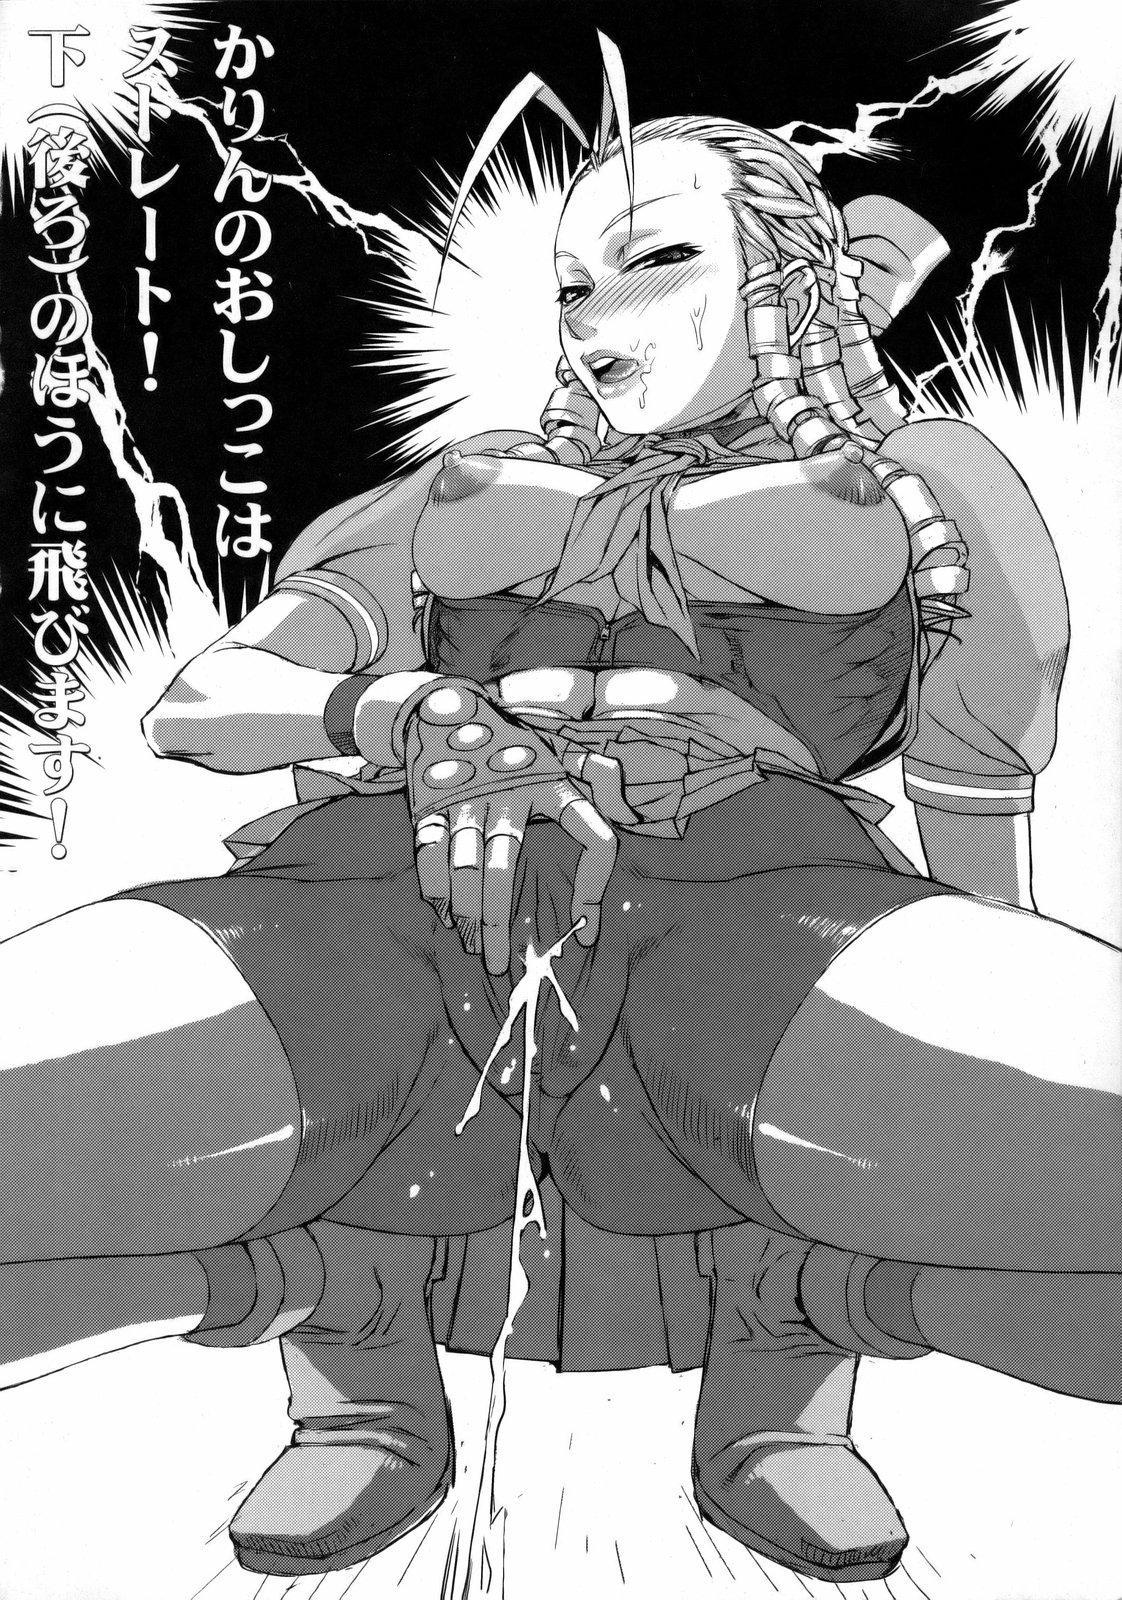 KETSU! MEGATON Chun-li 2